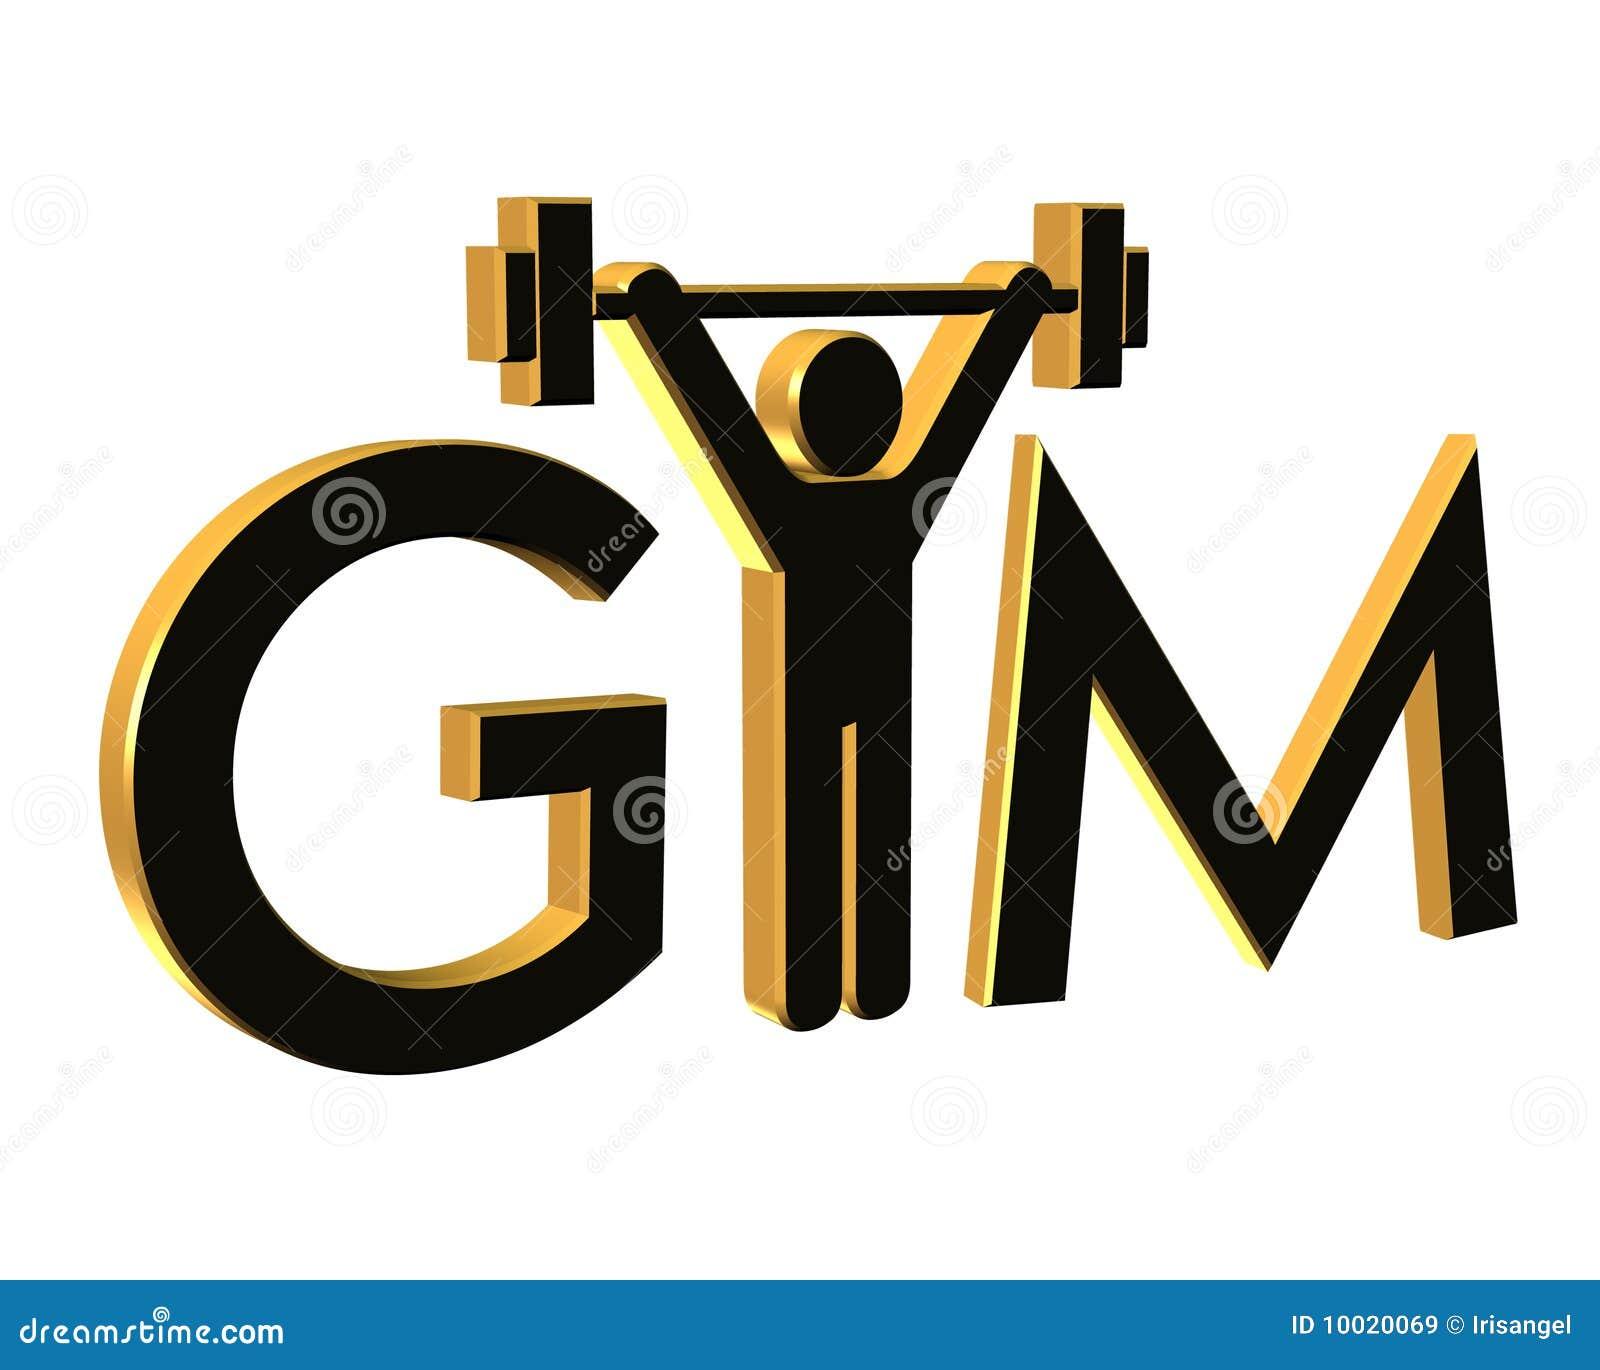 Fitness center business plan